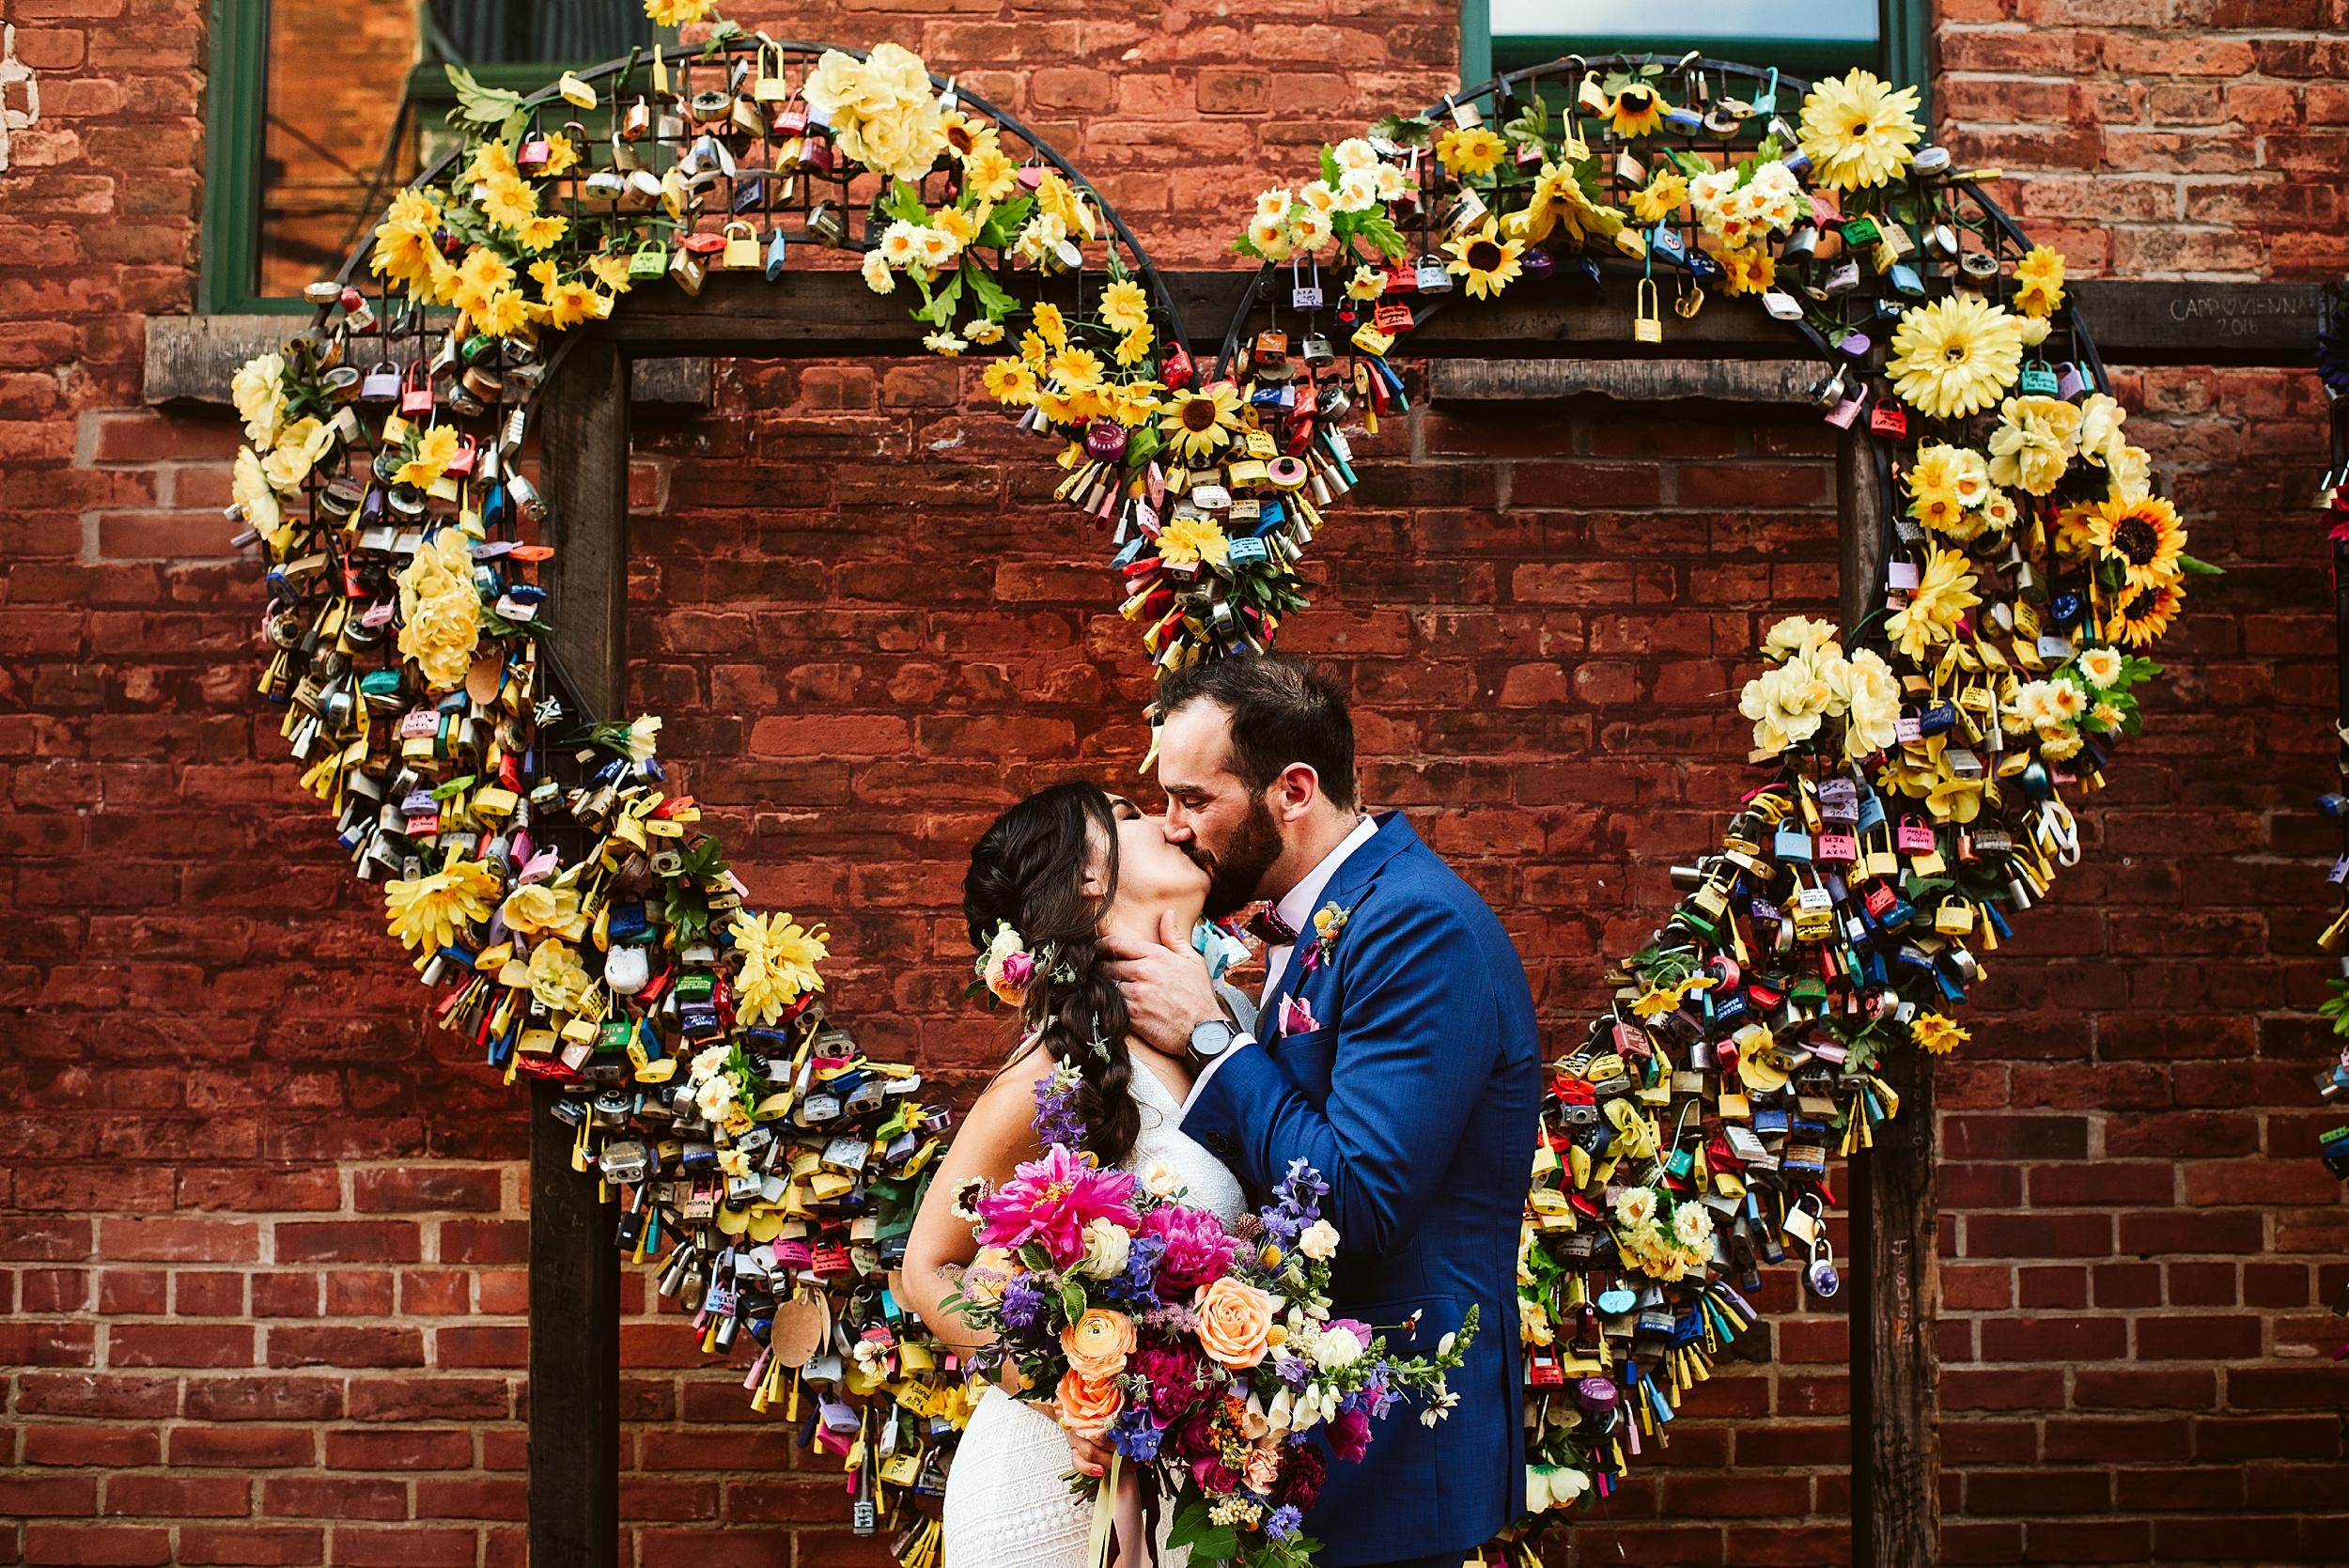 Airship-37-Berkeley-Events-Distillery-District-Wedding-Toronto-Wedding-Photographers_0046.jpg